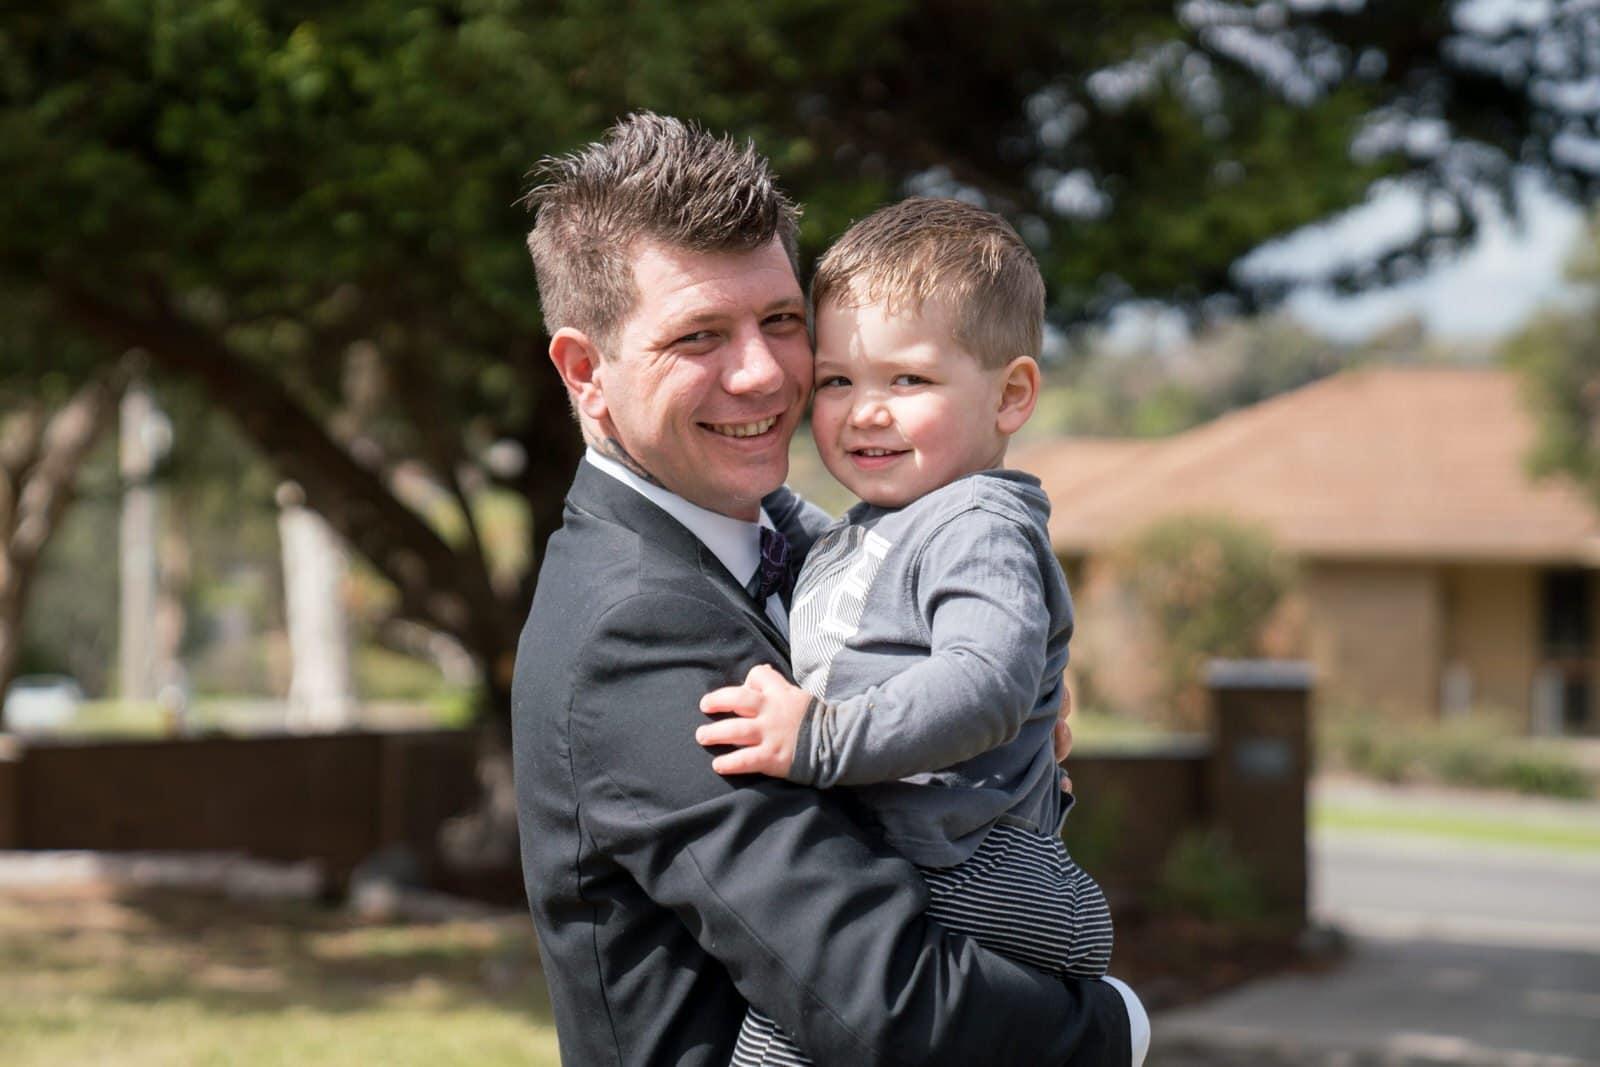 Melbourne Wedding Photographer Groom with son